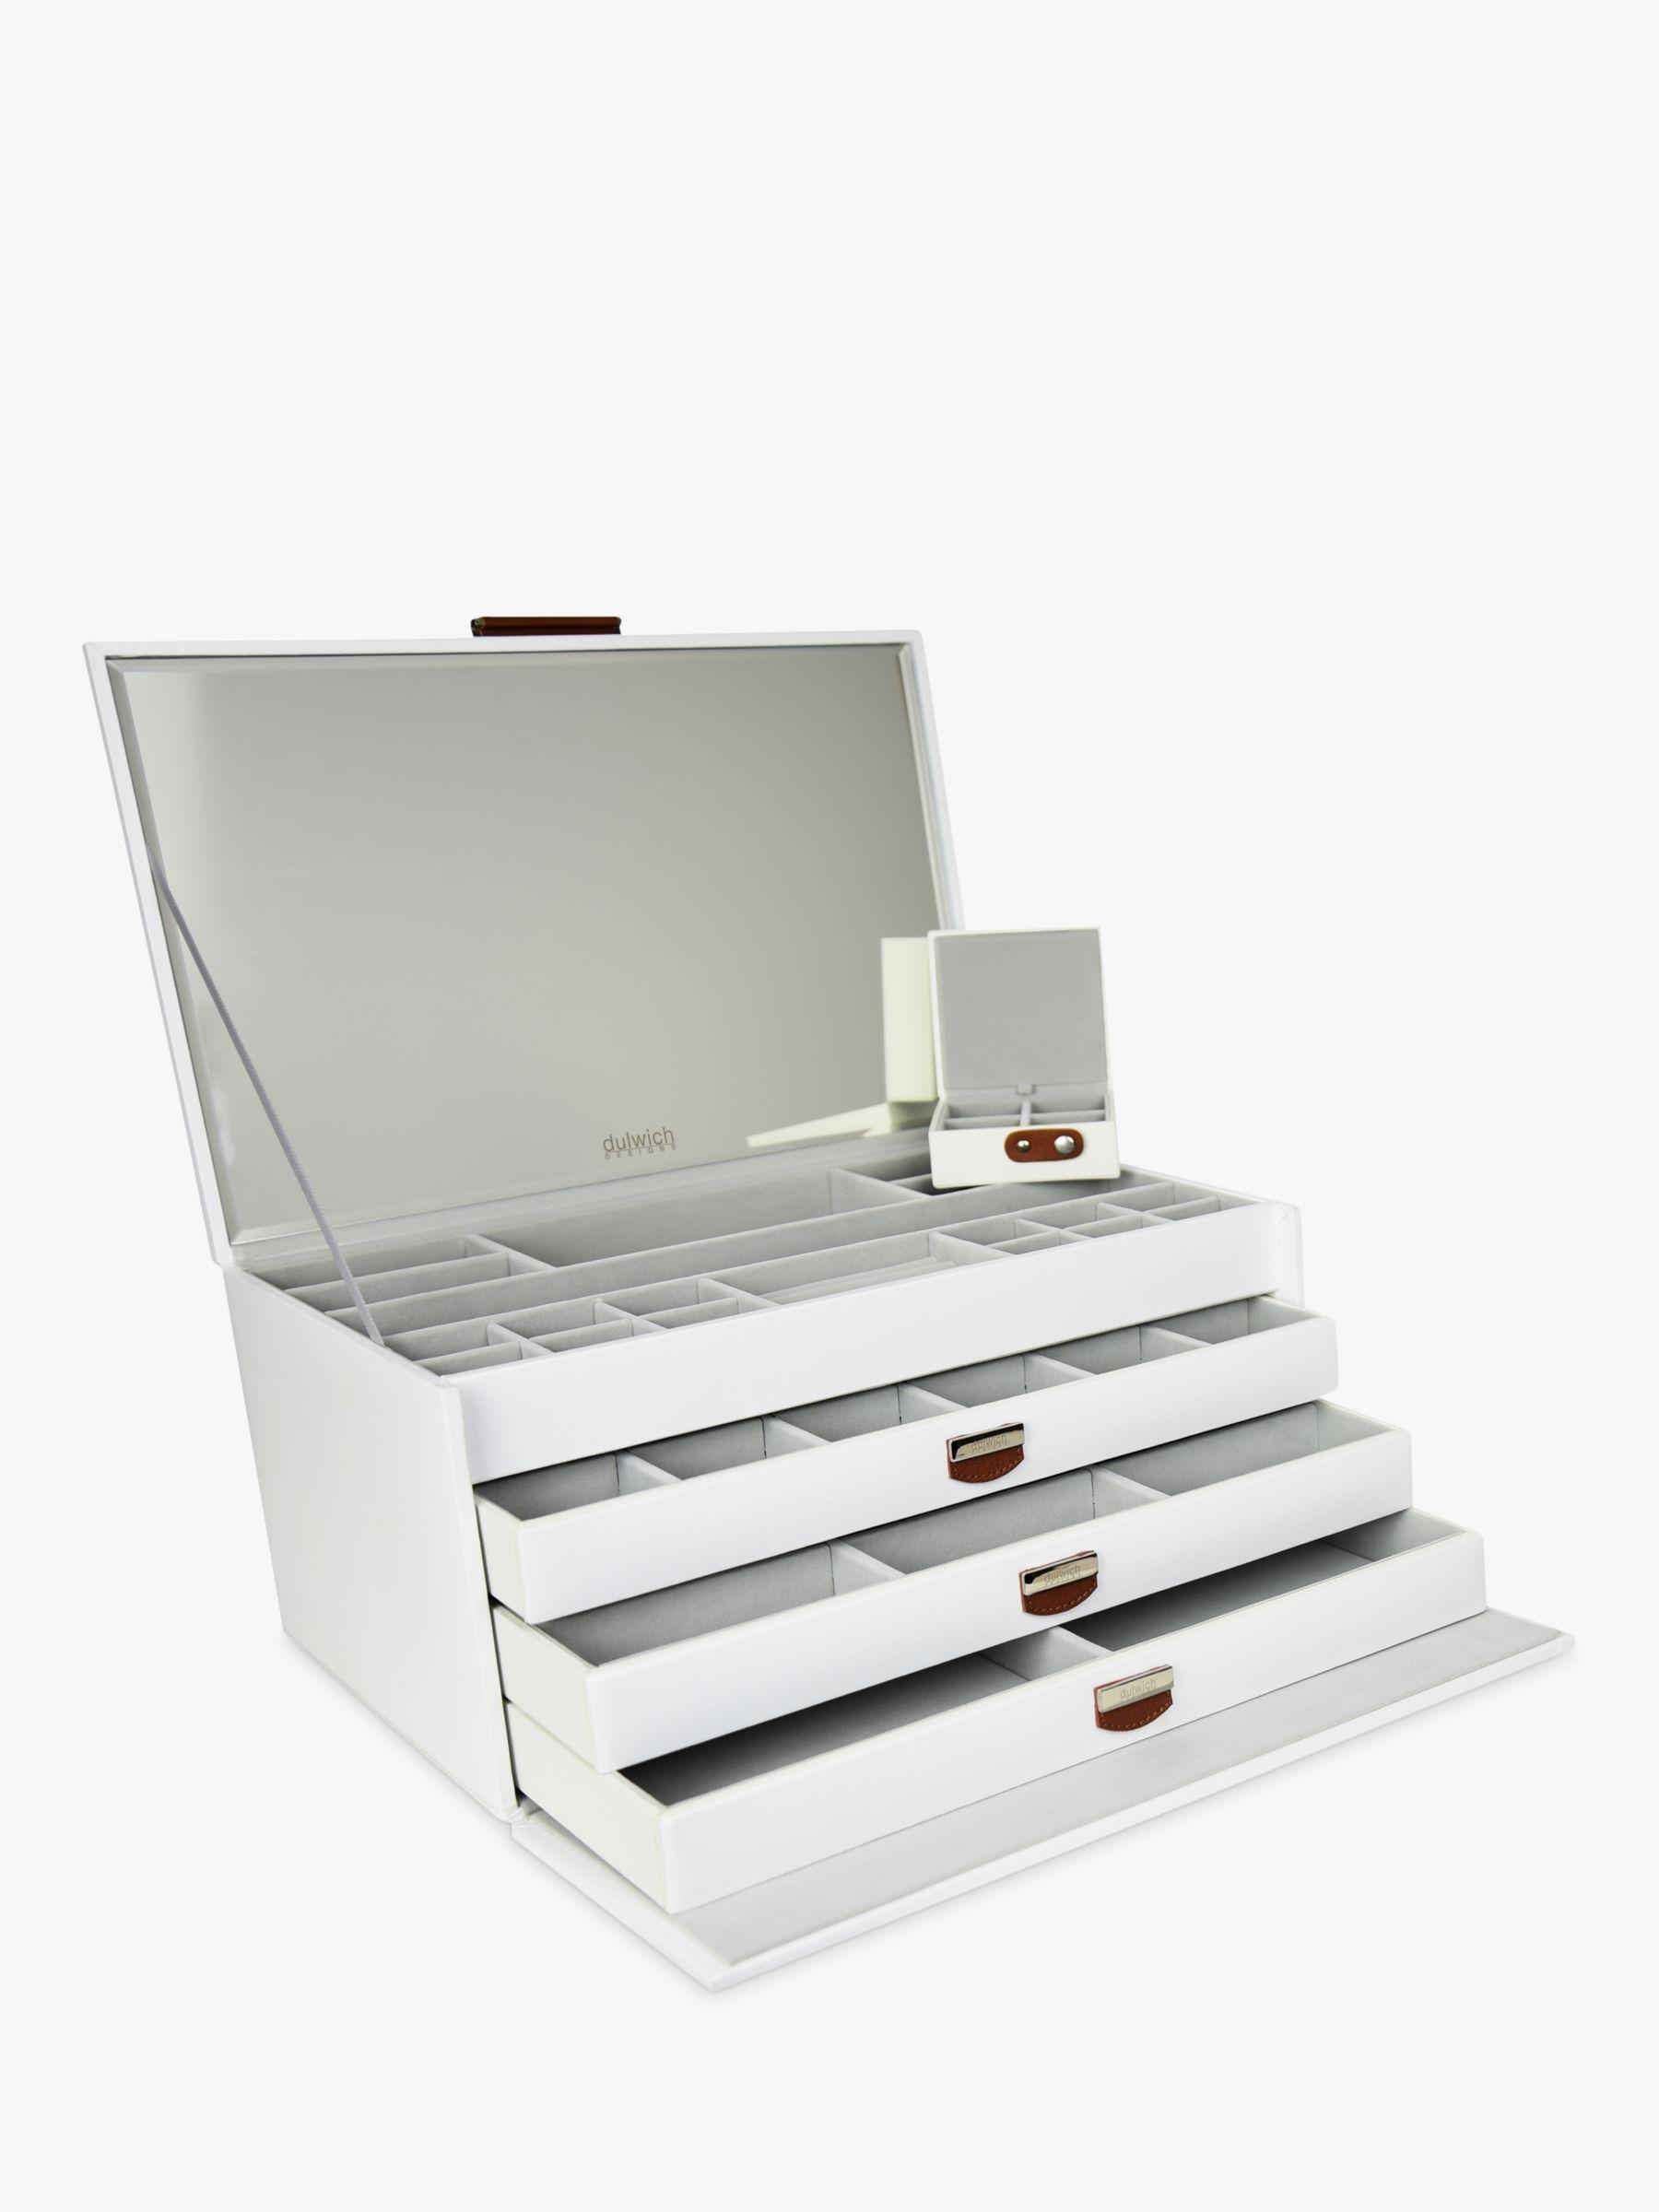 Dulwich Designs DDM XL JEWLRY BOX WHITE